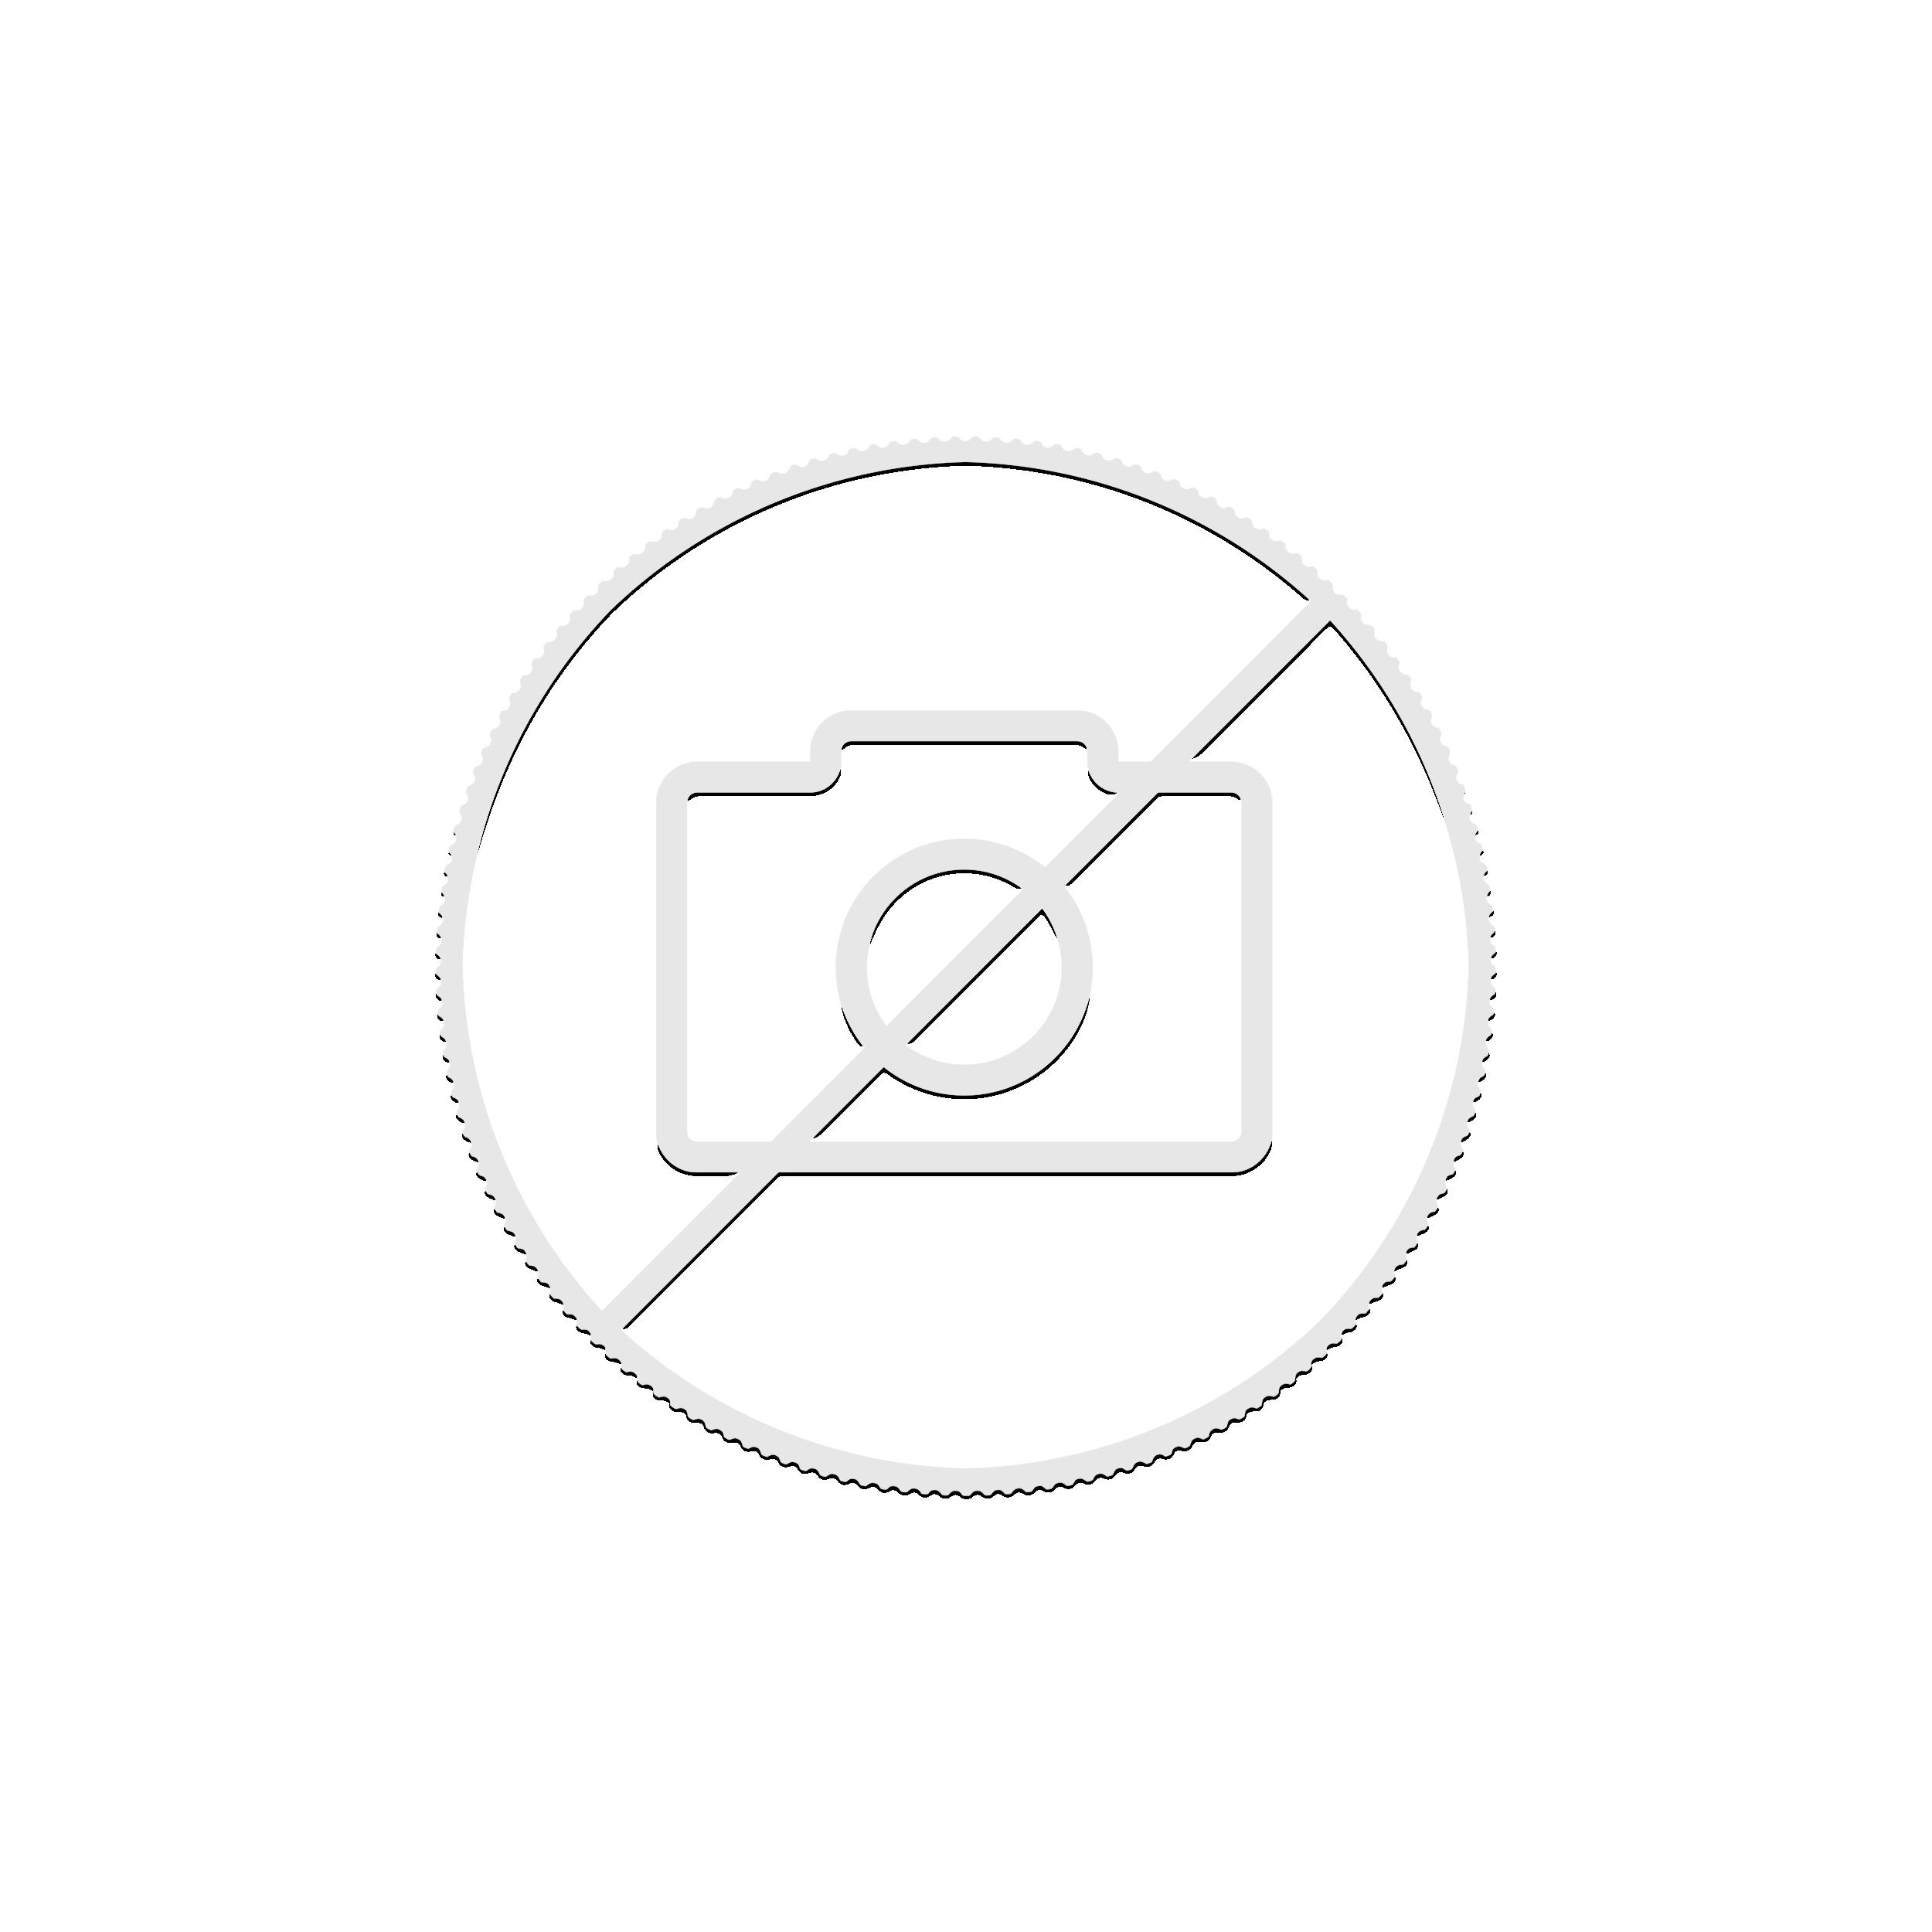 1 troy ounce zilveren munt gouden holo serie Maple Leaf 2021 - achterkant